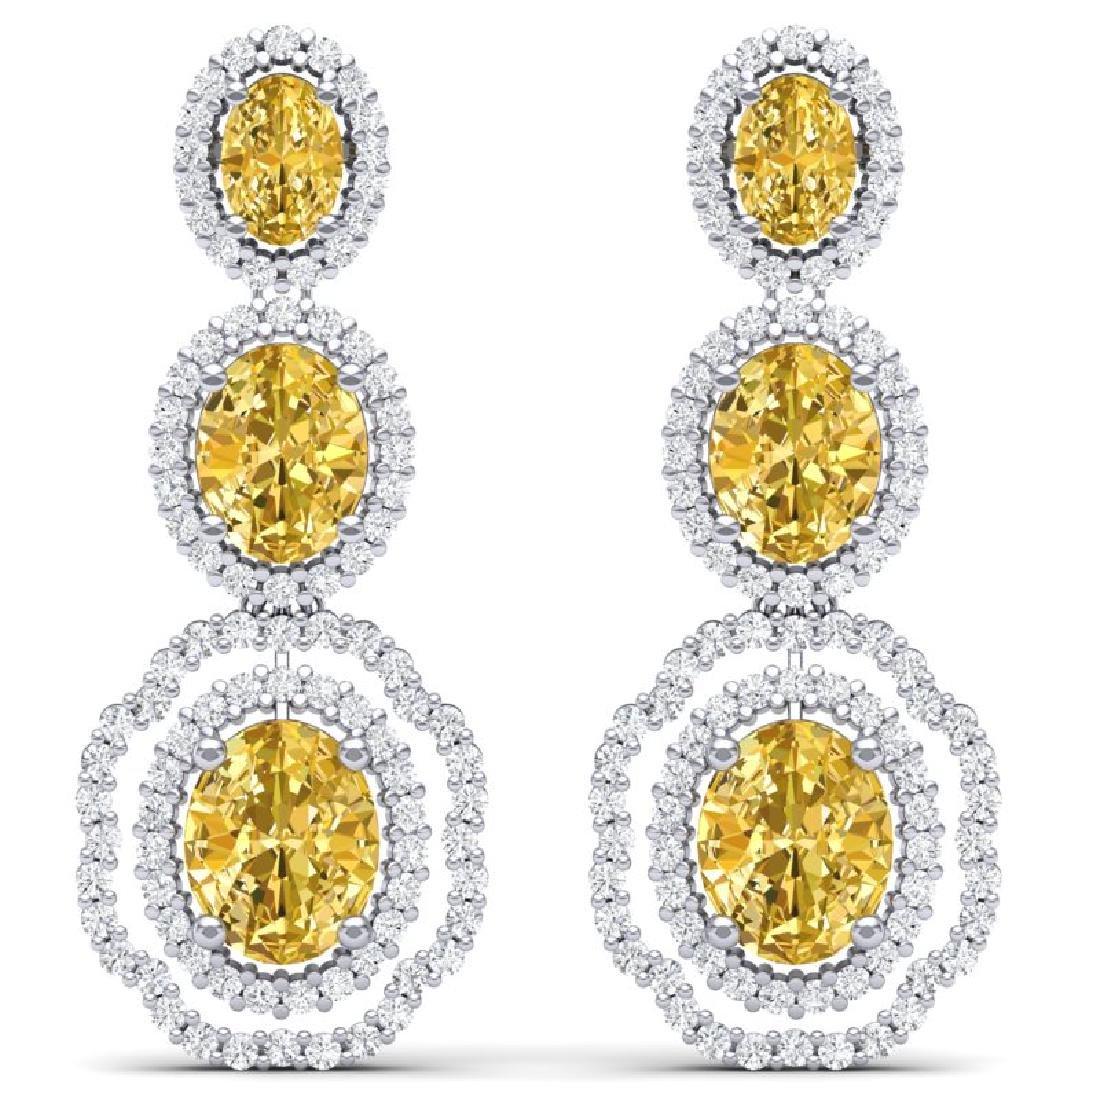 15.65 CTW Royalty Canary Citrine & VS Diamond Earrings